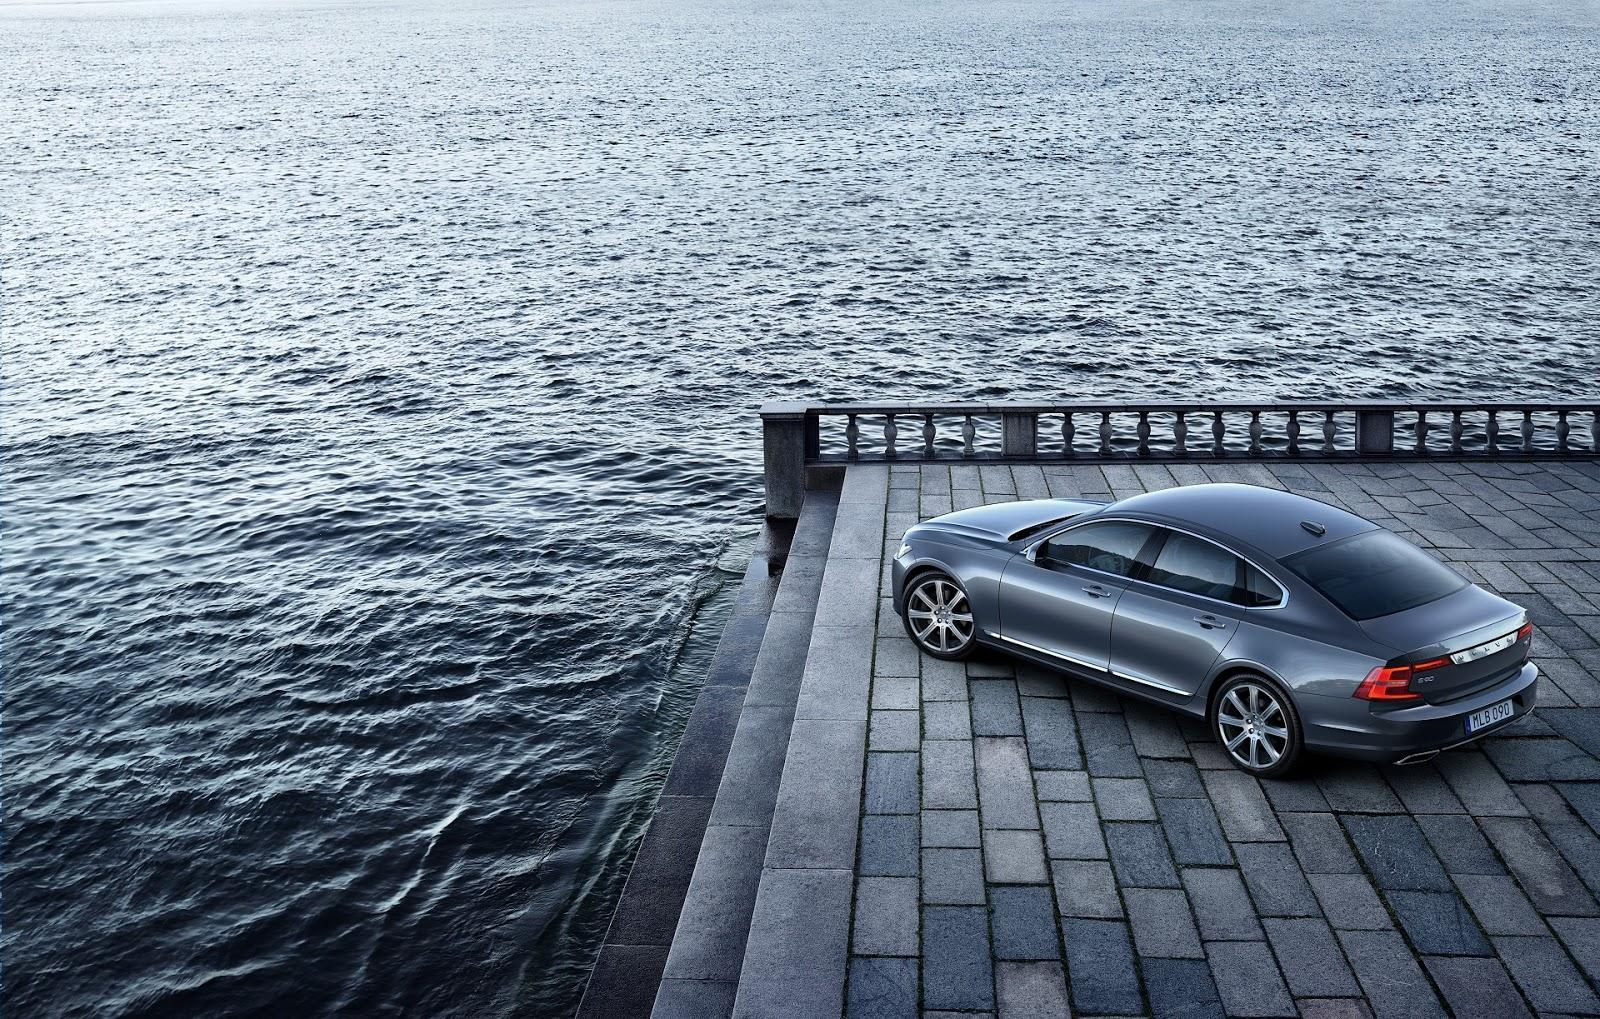 NEW%2BVOLVO%2BS90 170194 Location High Rear Quarter Osmium Grey Το νέο Volvo S90 έρχεται και βάζει φωτιά στον ανταγωνισμό premium sedan, Volvo, Volvo Cars, Volvo S90